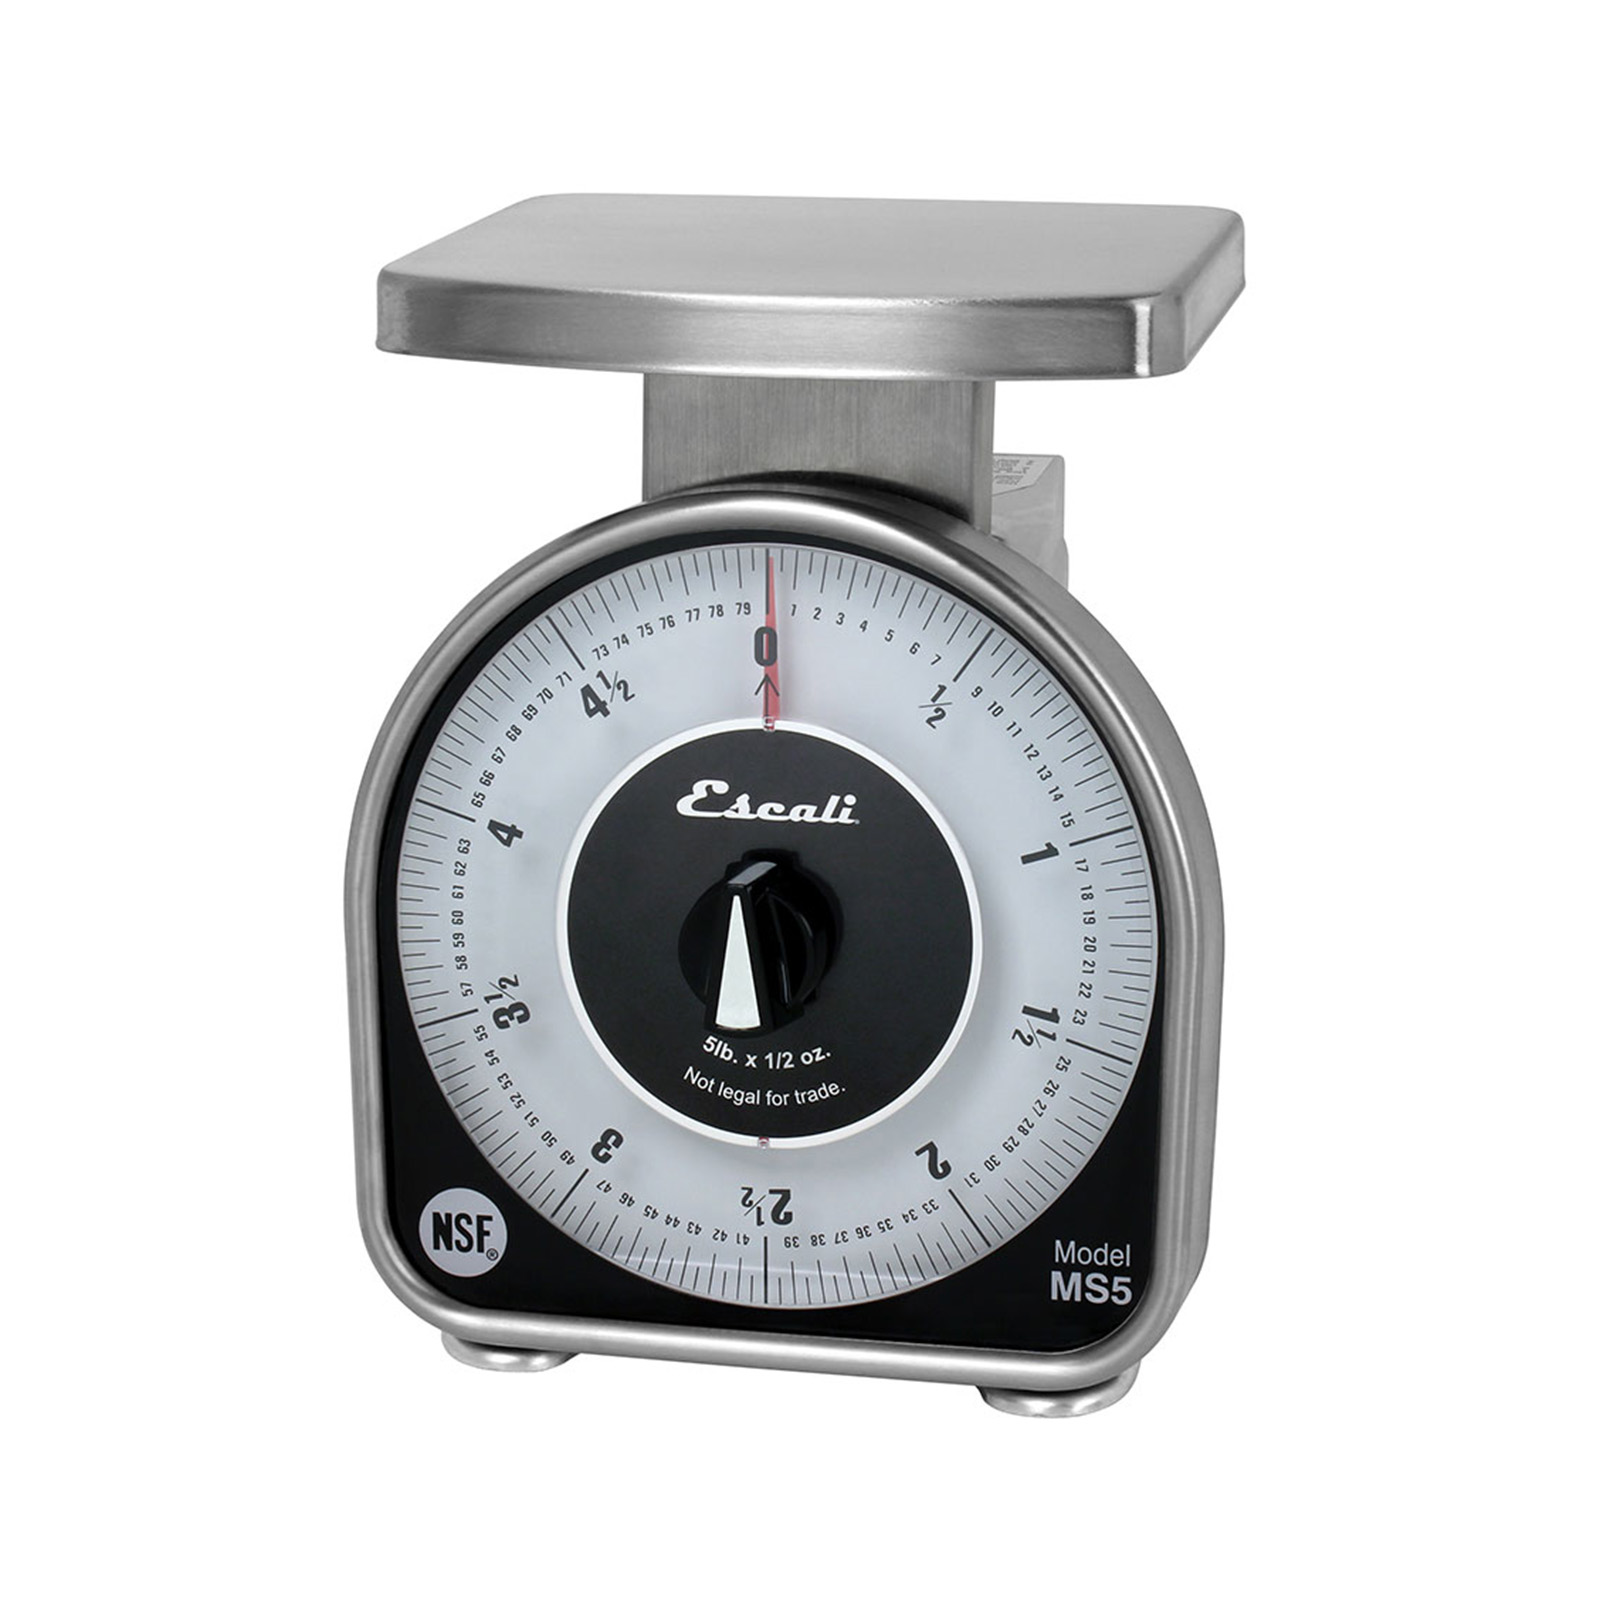 San Jamar SCMDL5 Escali 5 lb Mechanical Dial Scale - 4 5/8